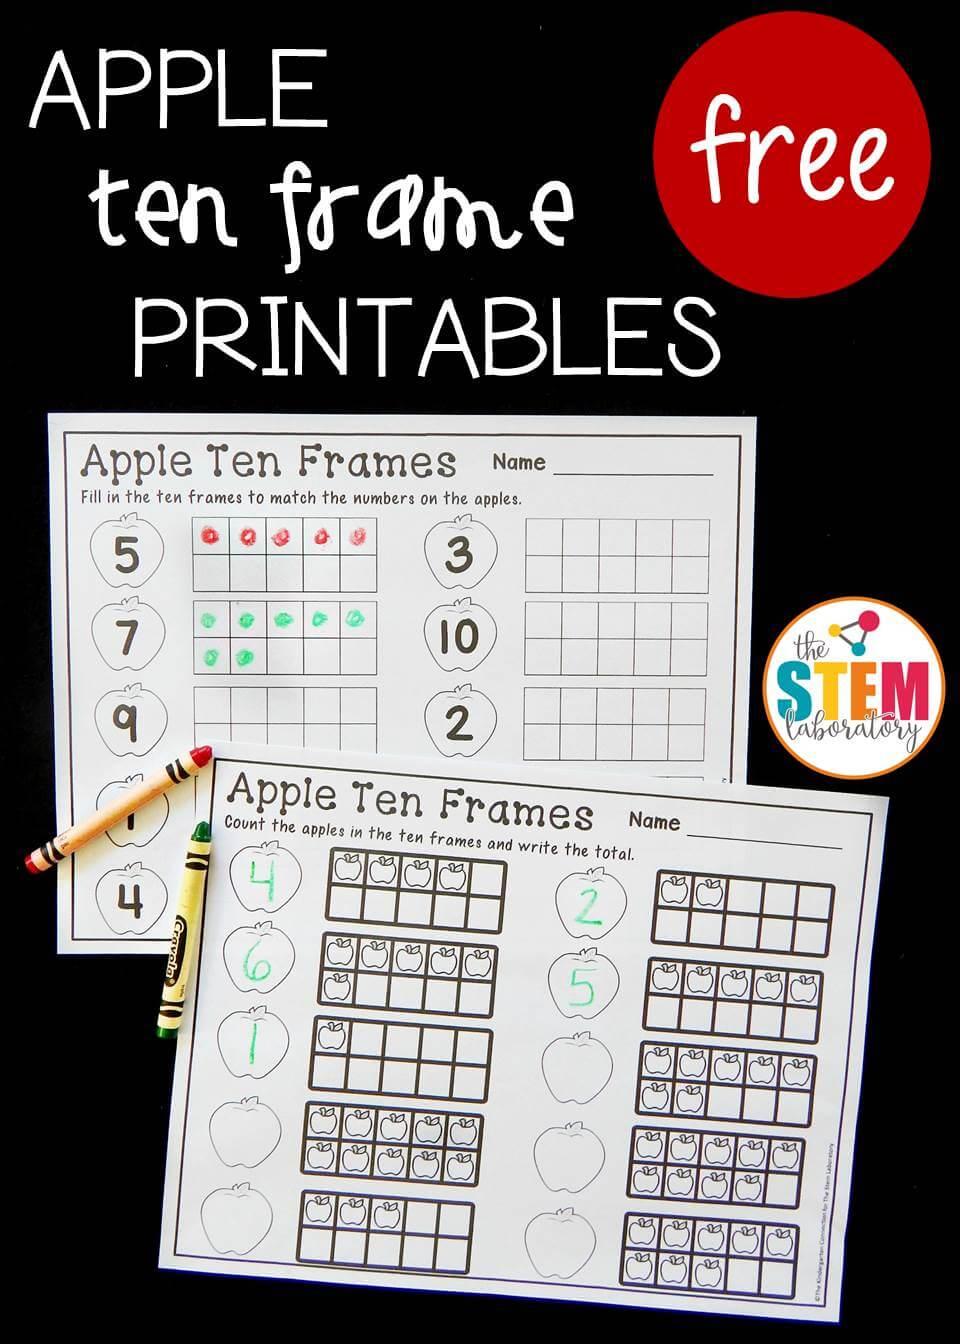 hight resolution of Apple Ten Frame Printables - The Stem Laboratory